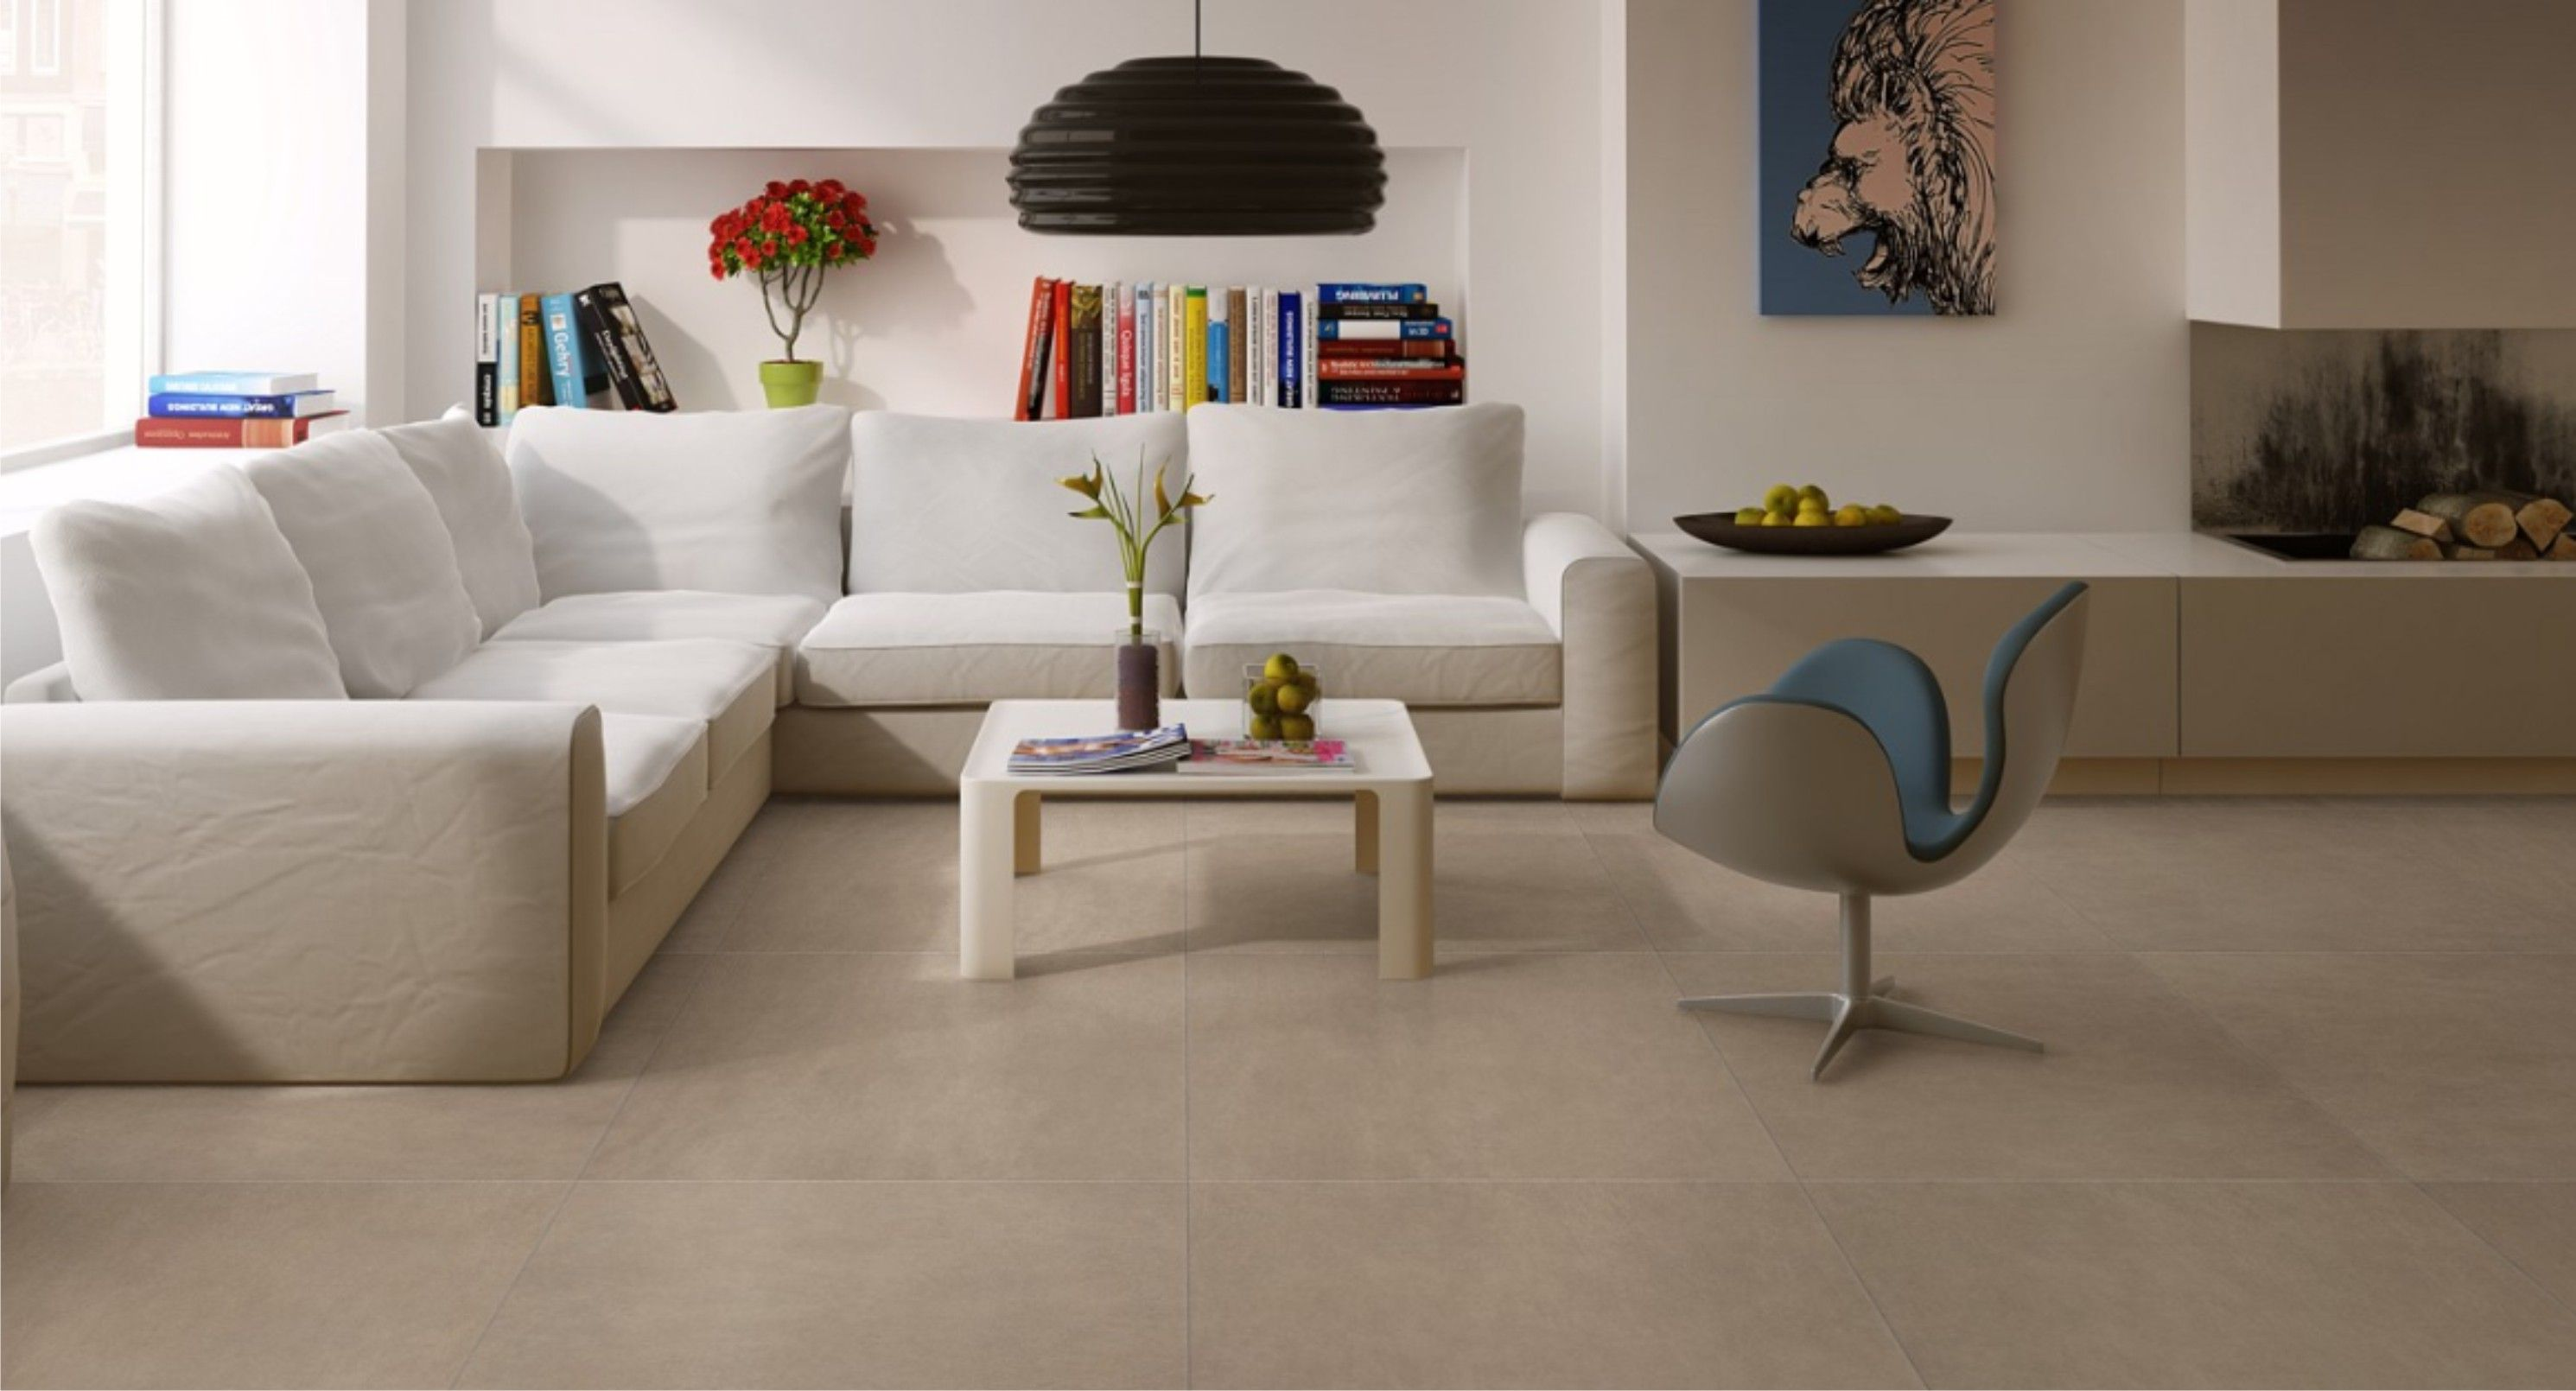 Laminaat tegels lederlook in de woonkamer | tg wonen | Pinterest